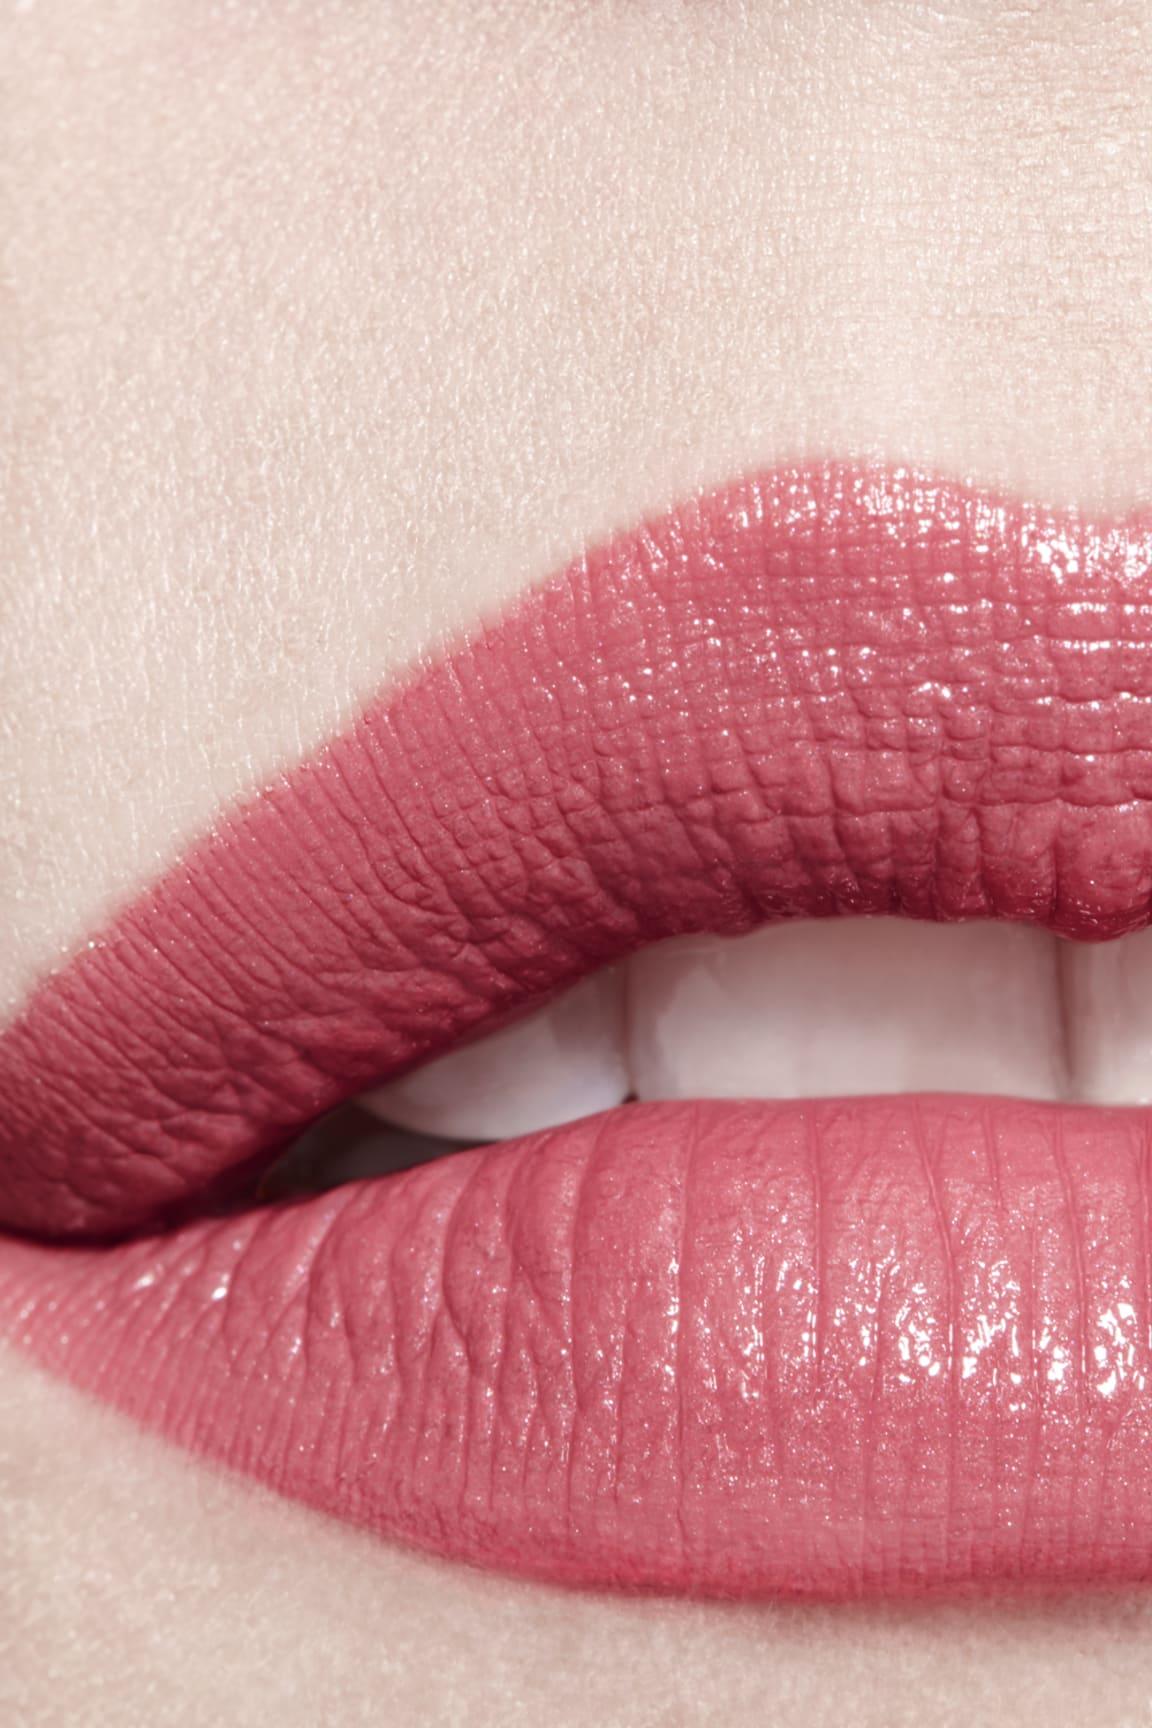 Anwendung Make-up-Bild 3 - ROUGE COCO 496 - TENDRESSE